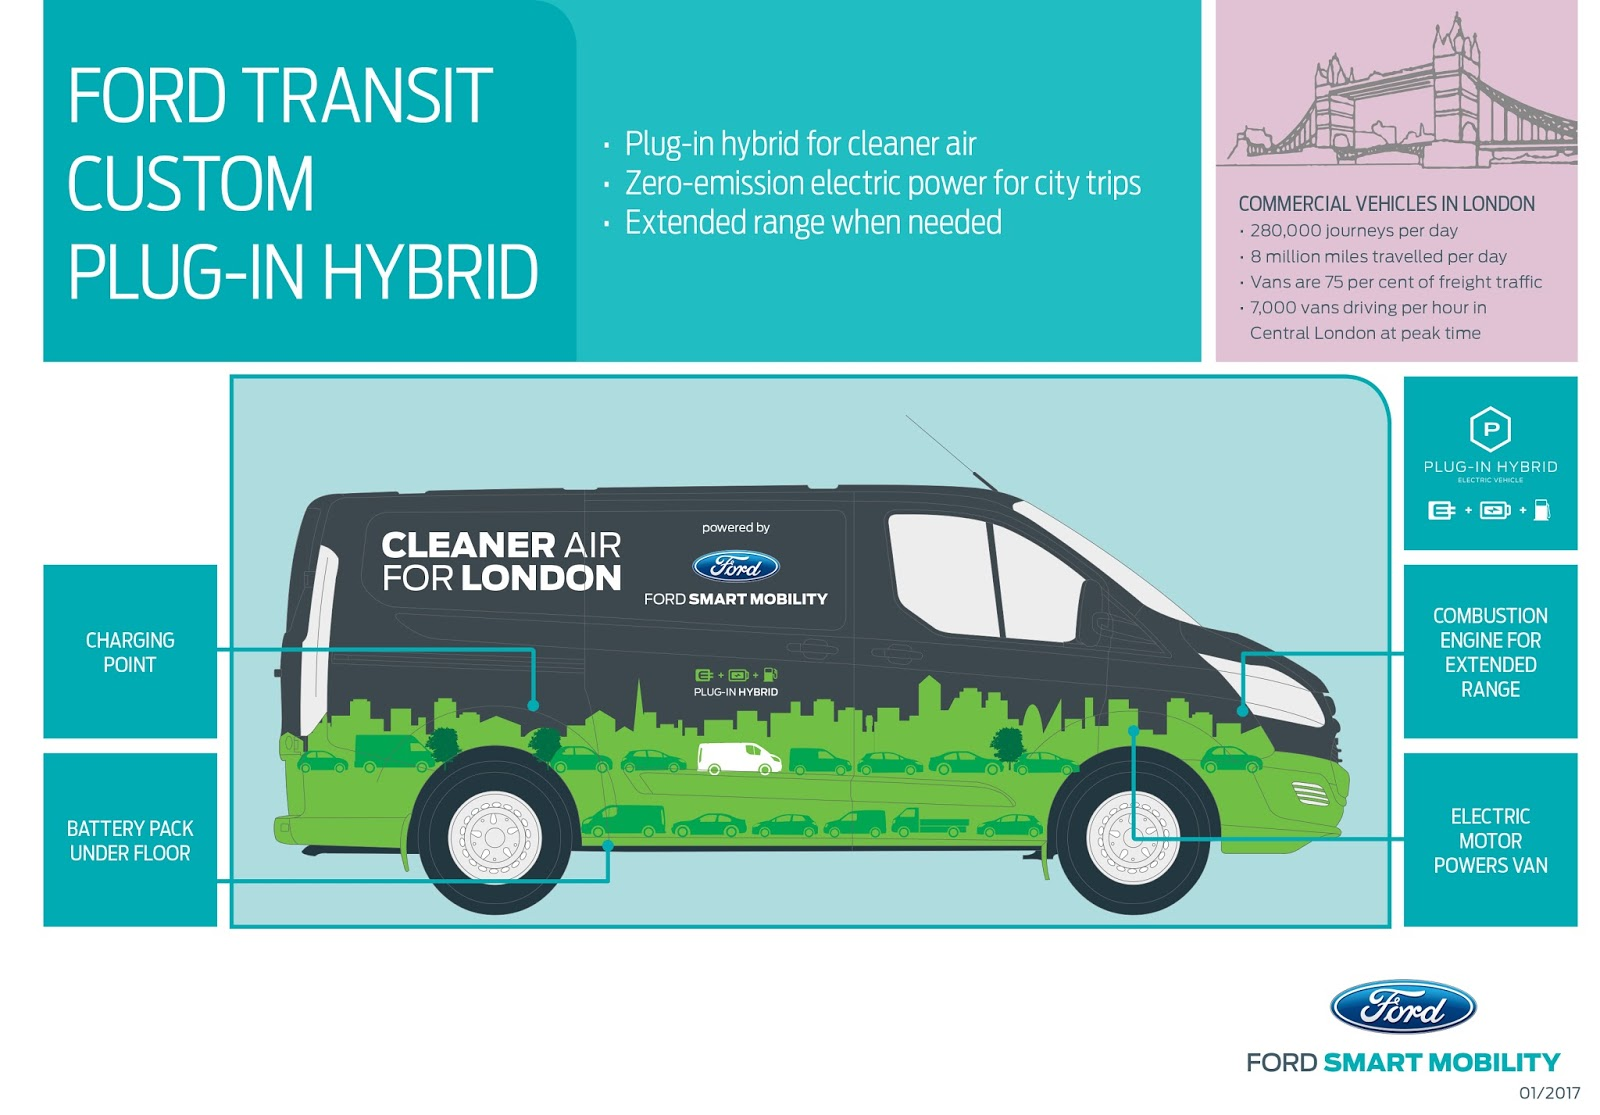 transit phev overview EU 1 Η Ford και το Λονδίνο ενώνουν τις δυνάμεις τους, για τη βελτίωση της ποιότητας του ατμοσφαιρικού αέρα! Electric cars, Ford, Ford Transit, Ford Transit Custom, Περιβάλλον